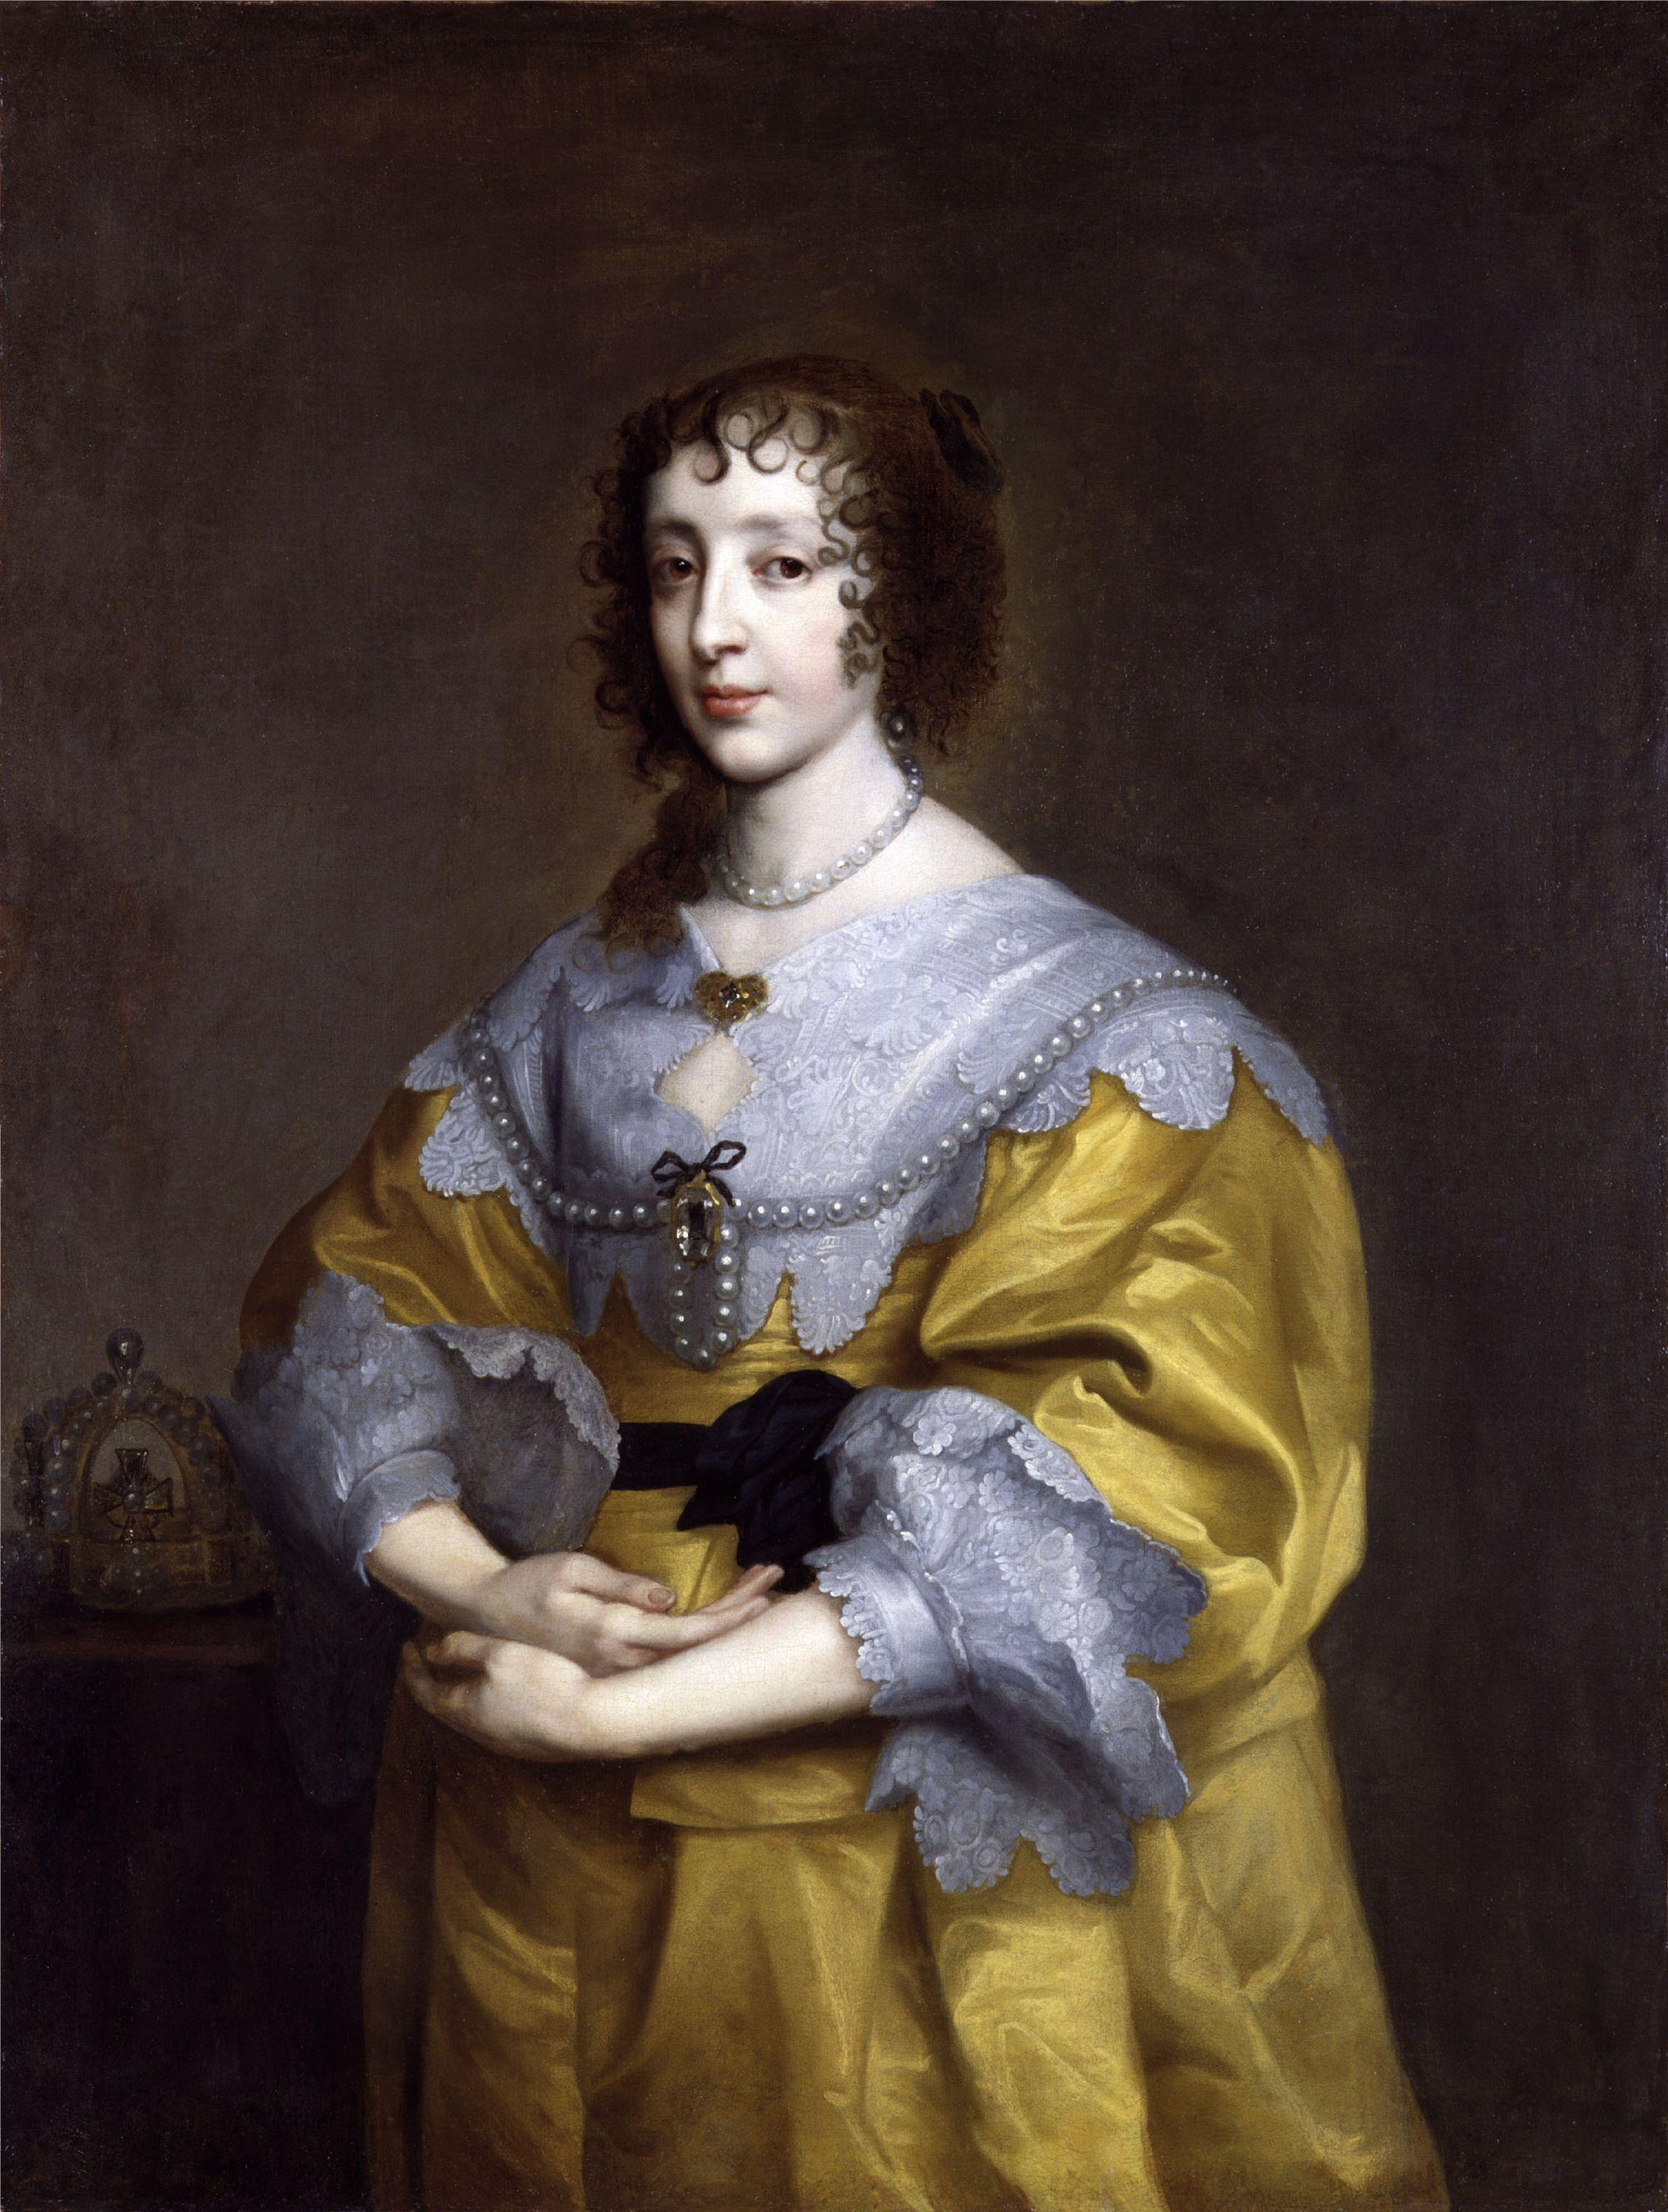 Shedding Light On A Dark Era Baroque Cavalier And Puritan Fashions The Pragmatic Costumer